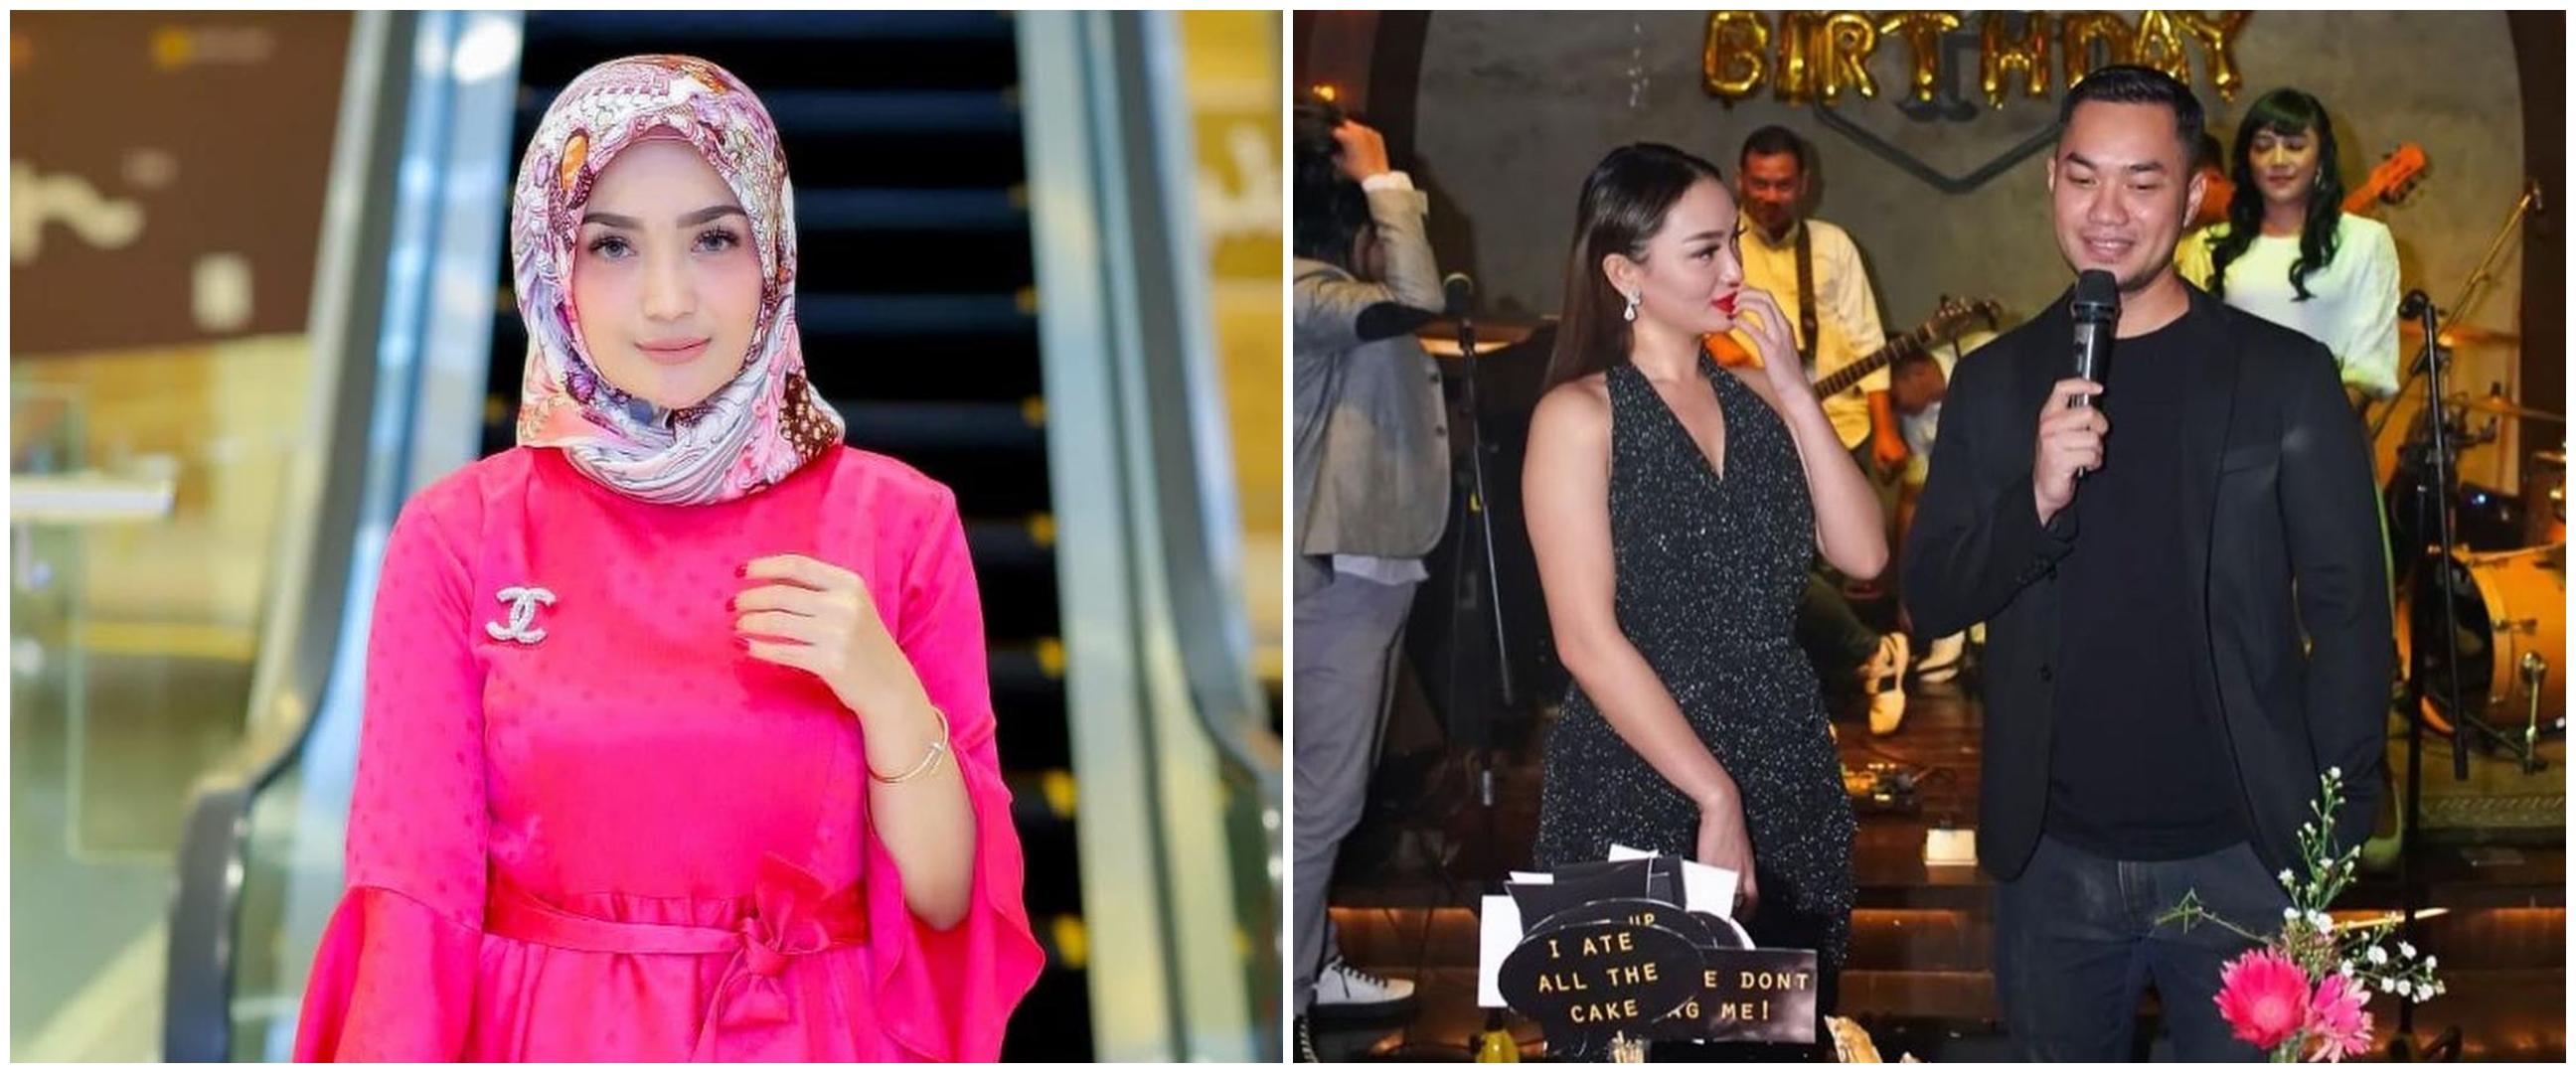 10 Potret terbaru Imel Putri, artis FTV mantan istri Sirajuddin Mahmud